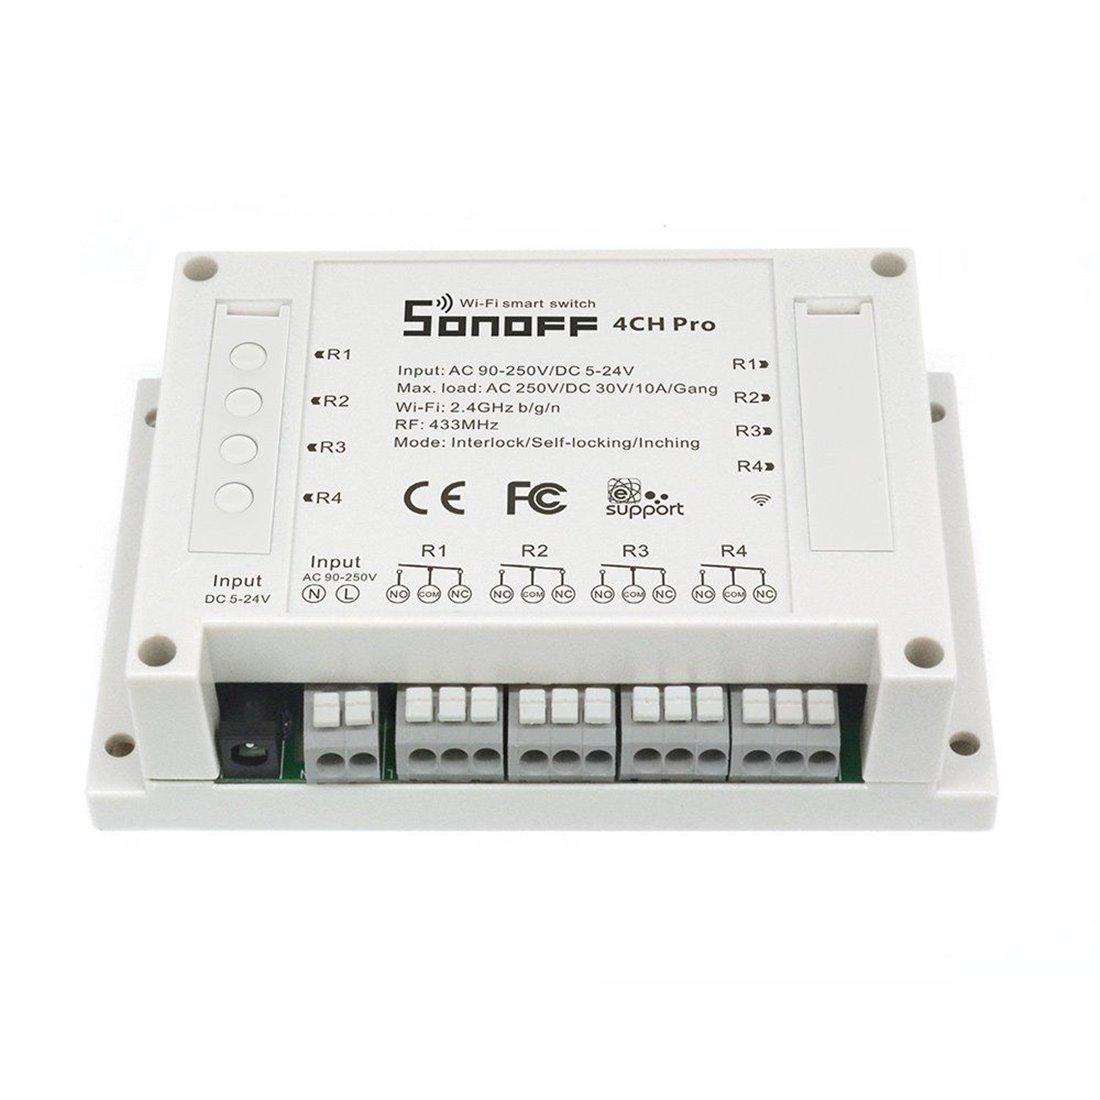 Sonoff 4CH Pro - 4 Canaux Inching/Auto-verrouillage/Interverrouillage Wifi RF Commutateur Intelligent Interrupteur sans fil S